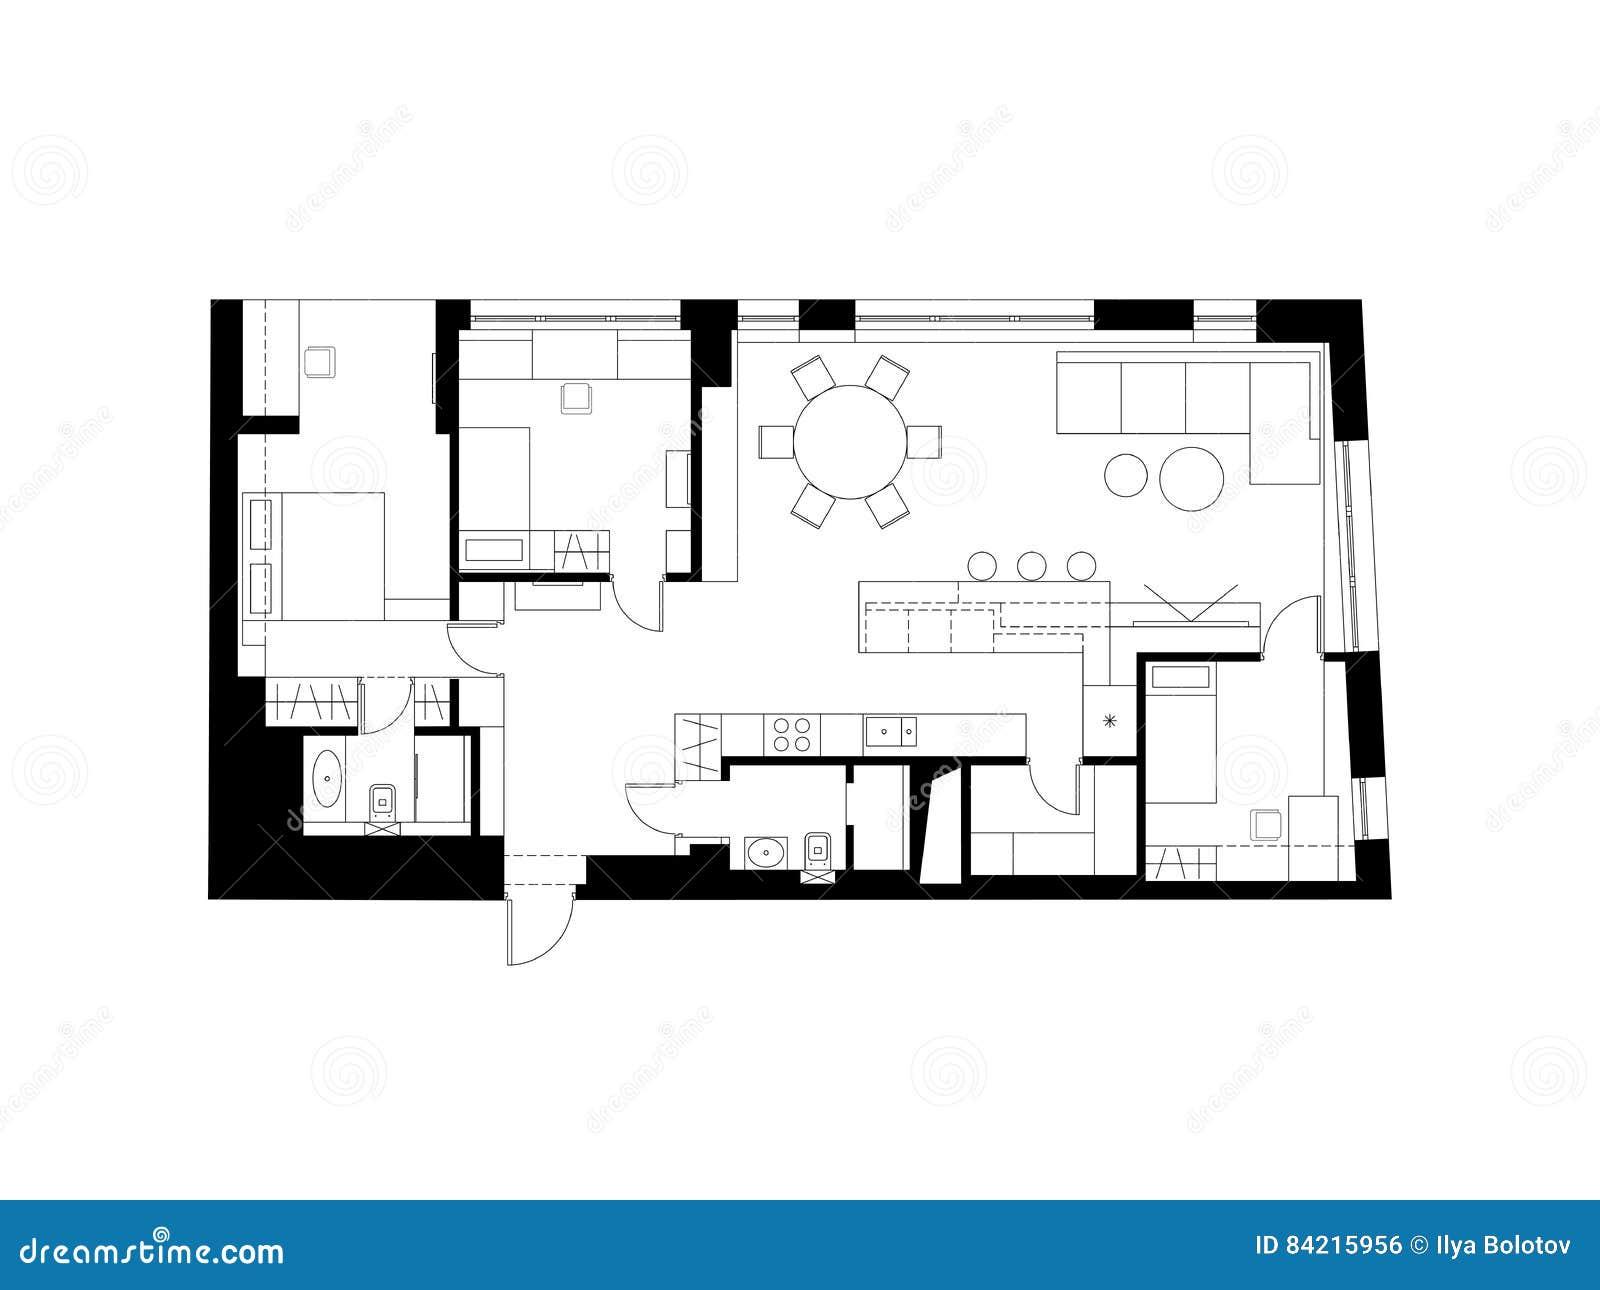 Architect cartoons illustrations vector stock images for Plano habitacion